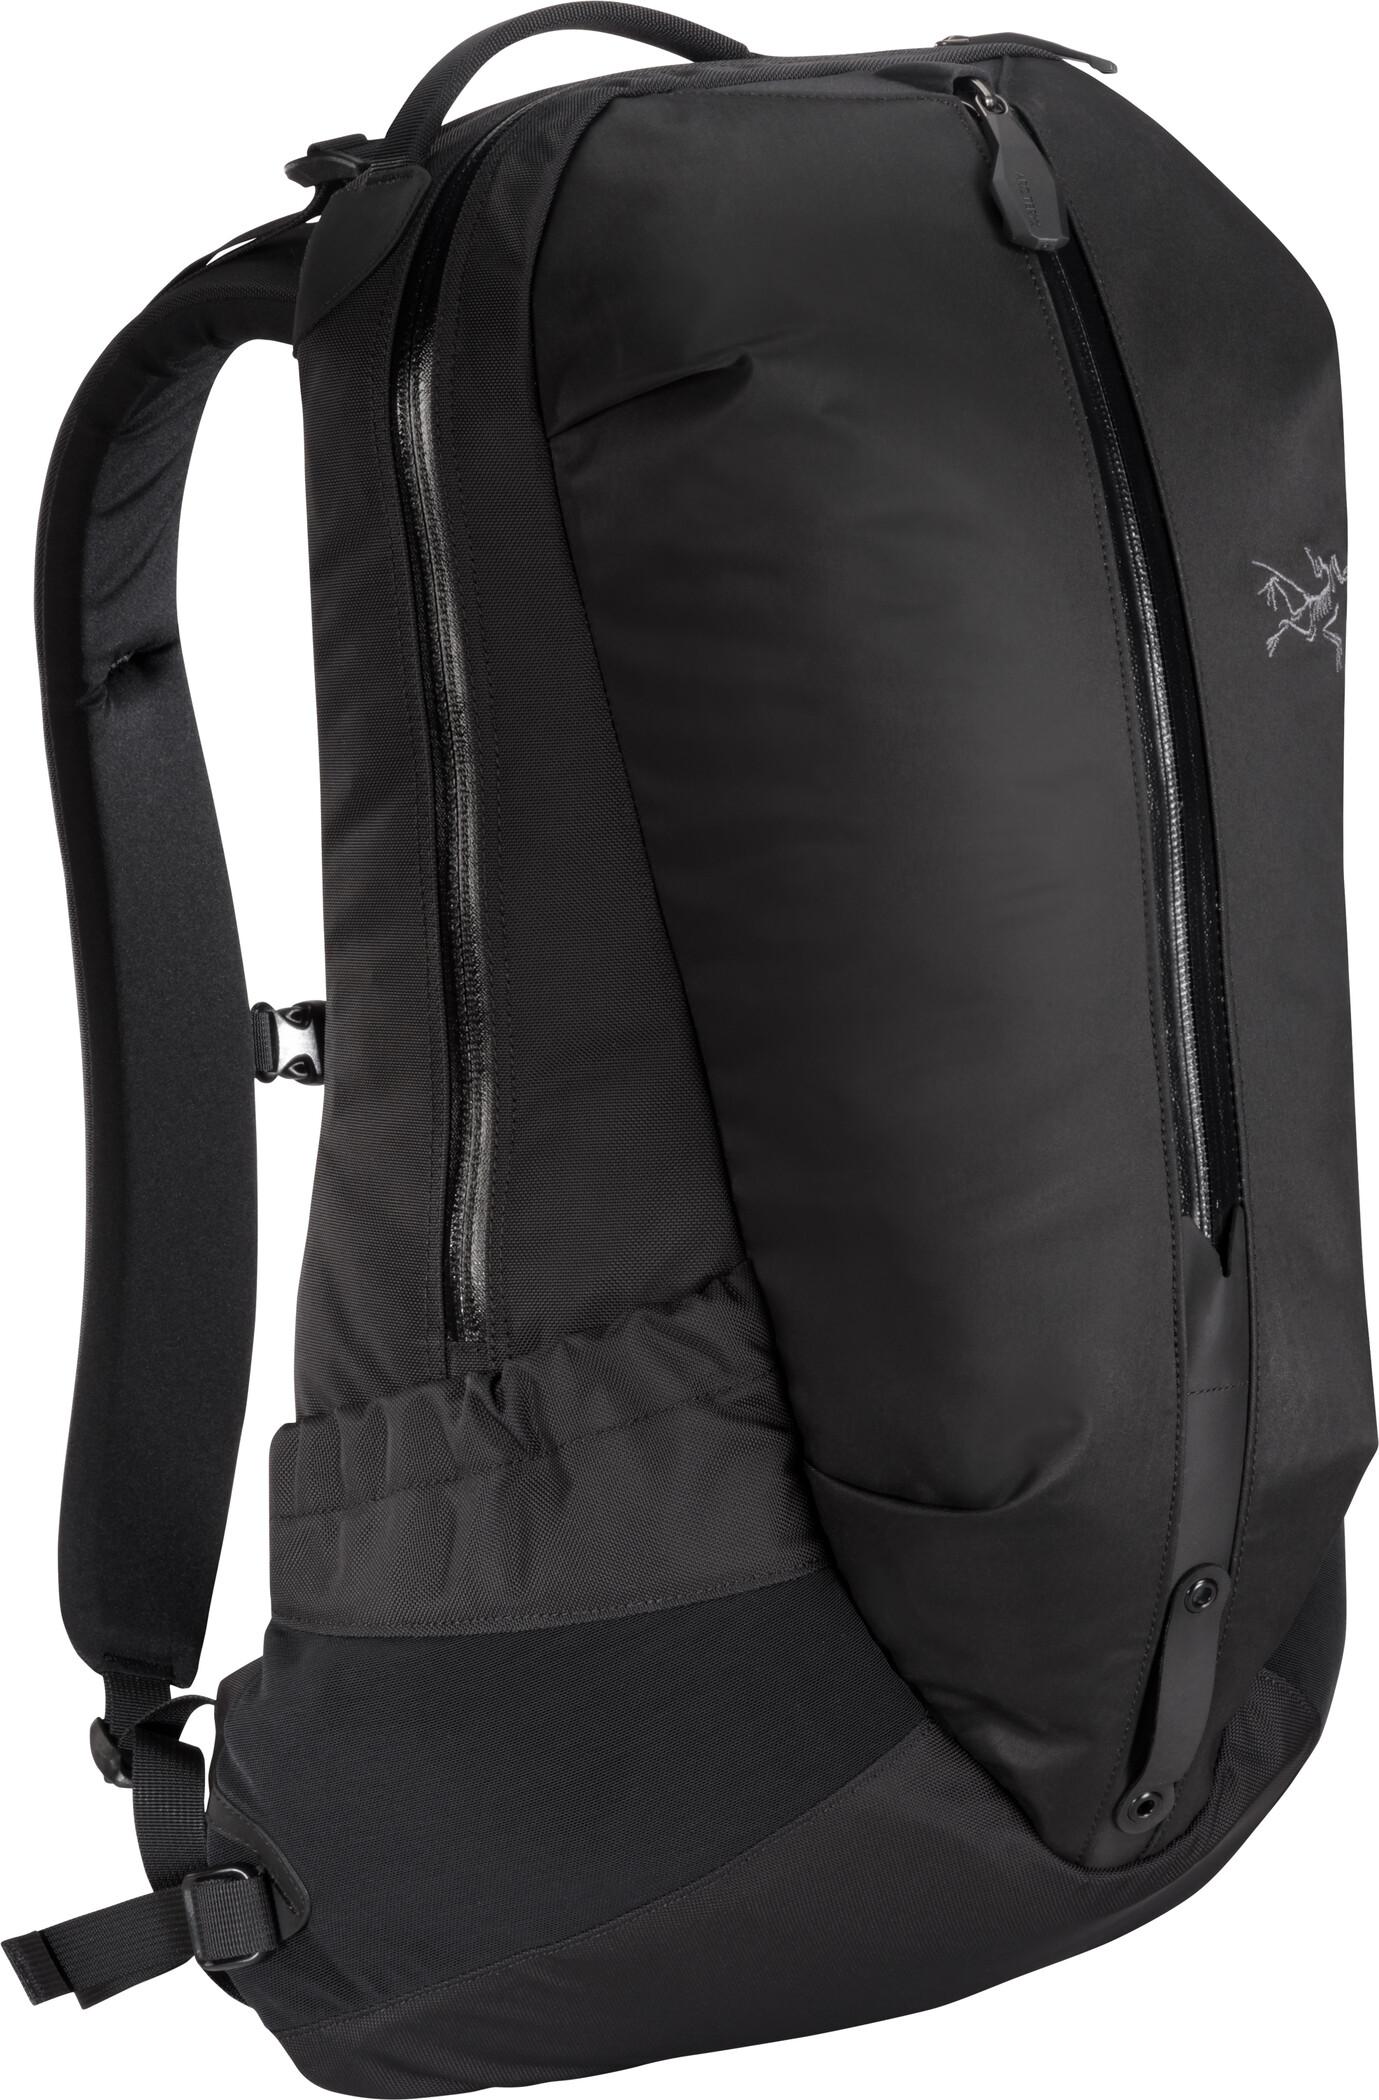 Arc'teryx Arro 22 Rygsæk, stealth black (2019)   Travel bags